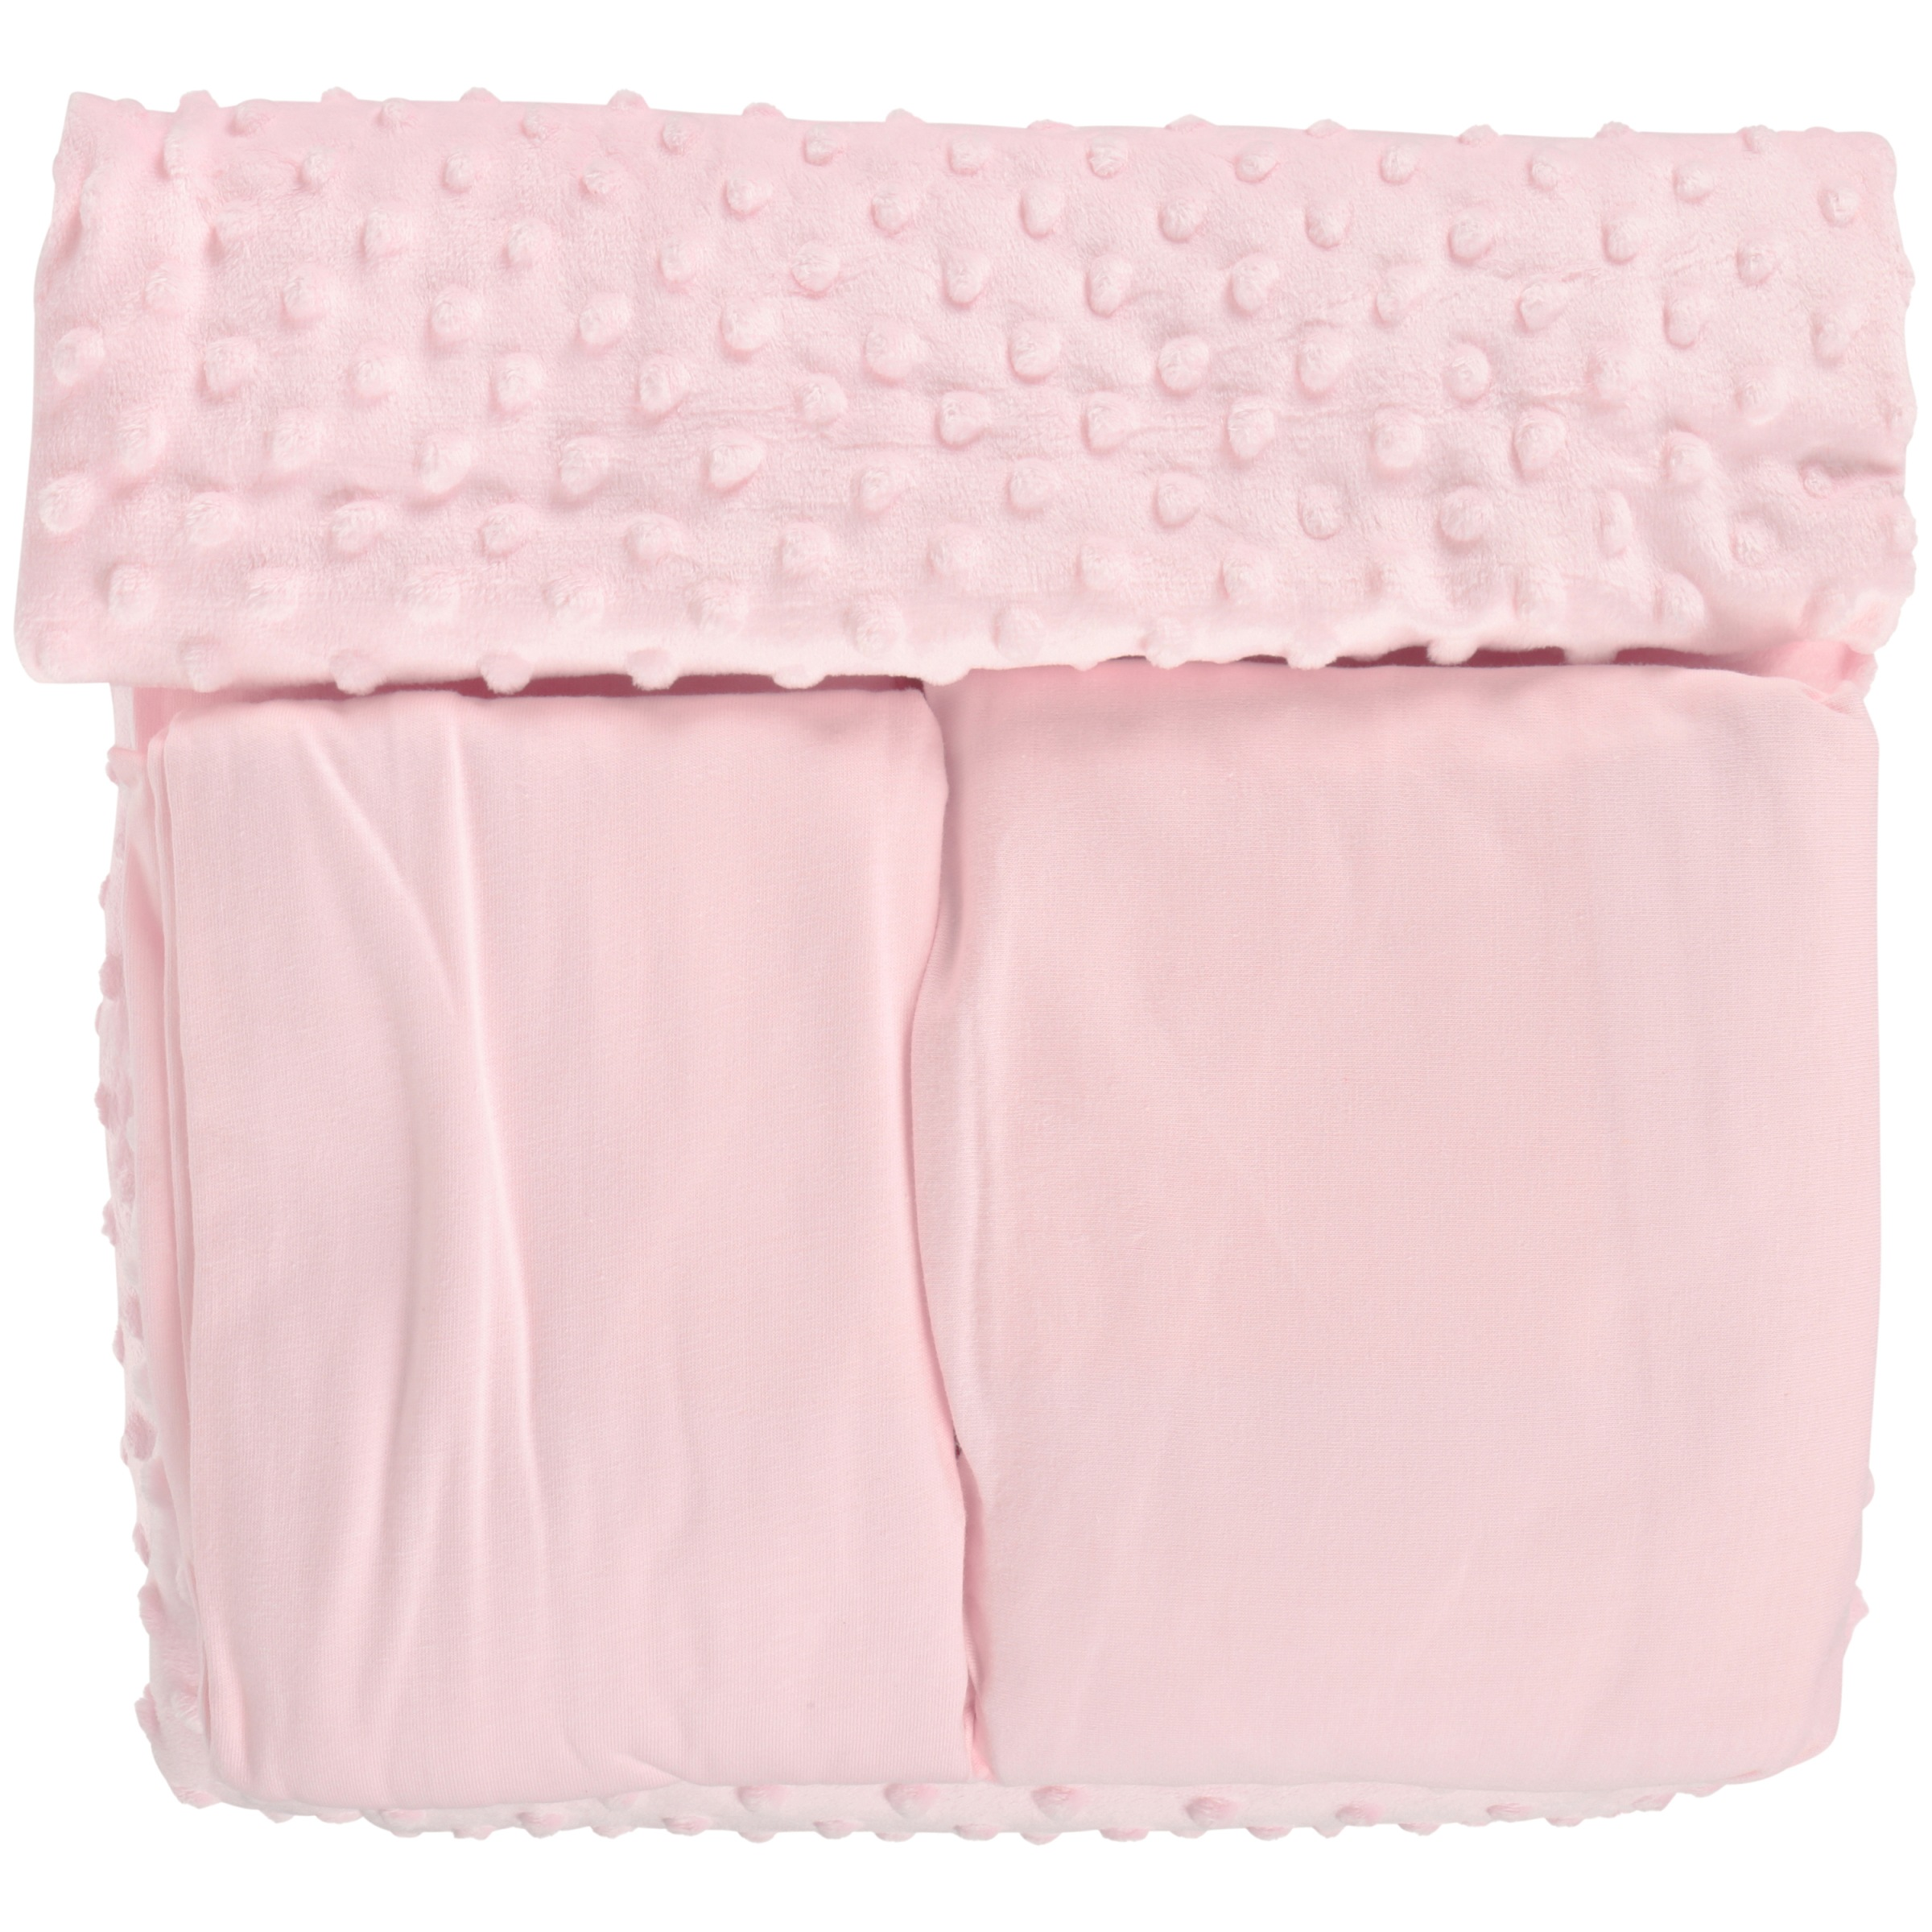 TL Care™ Heavenly Soft Pink Toddler Bedding Set 4 pc Pack